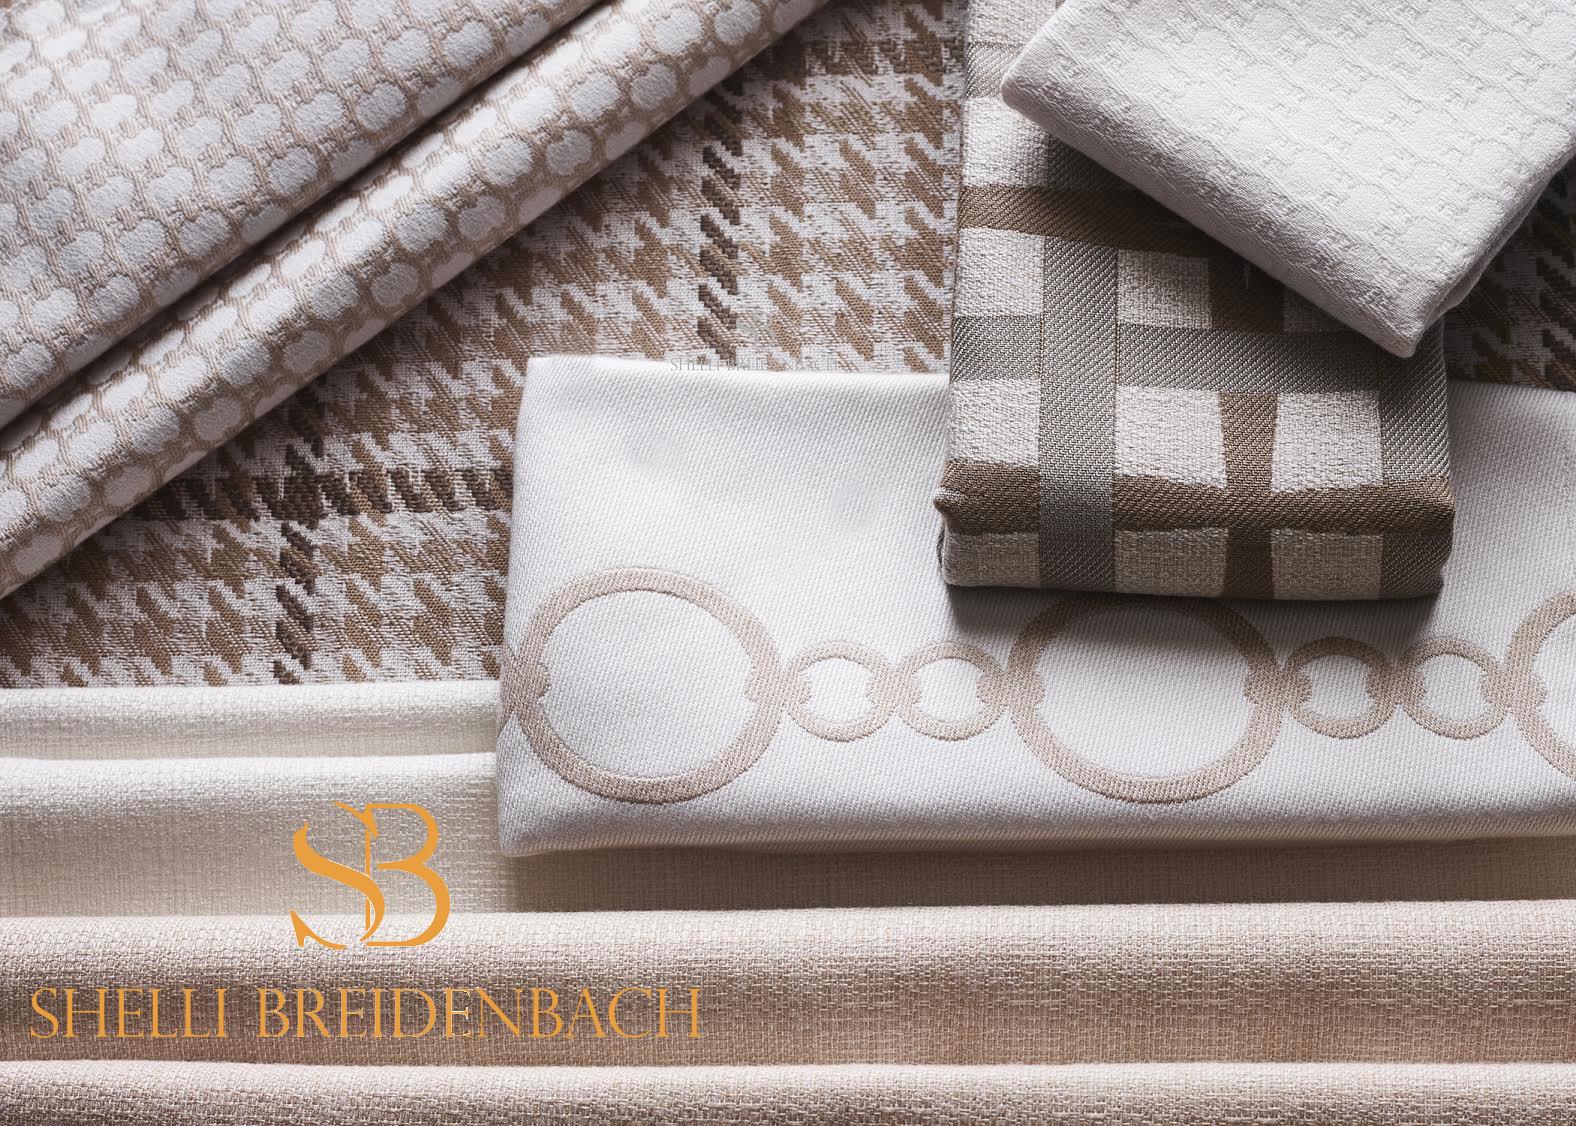 Shelli Breidenbach Sunbrella fabrics, Savel.PNG